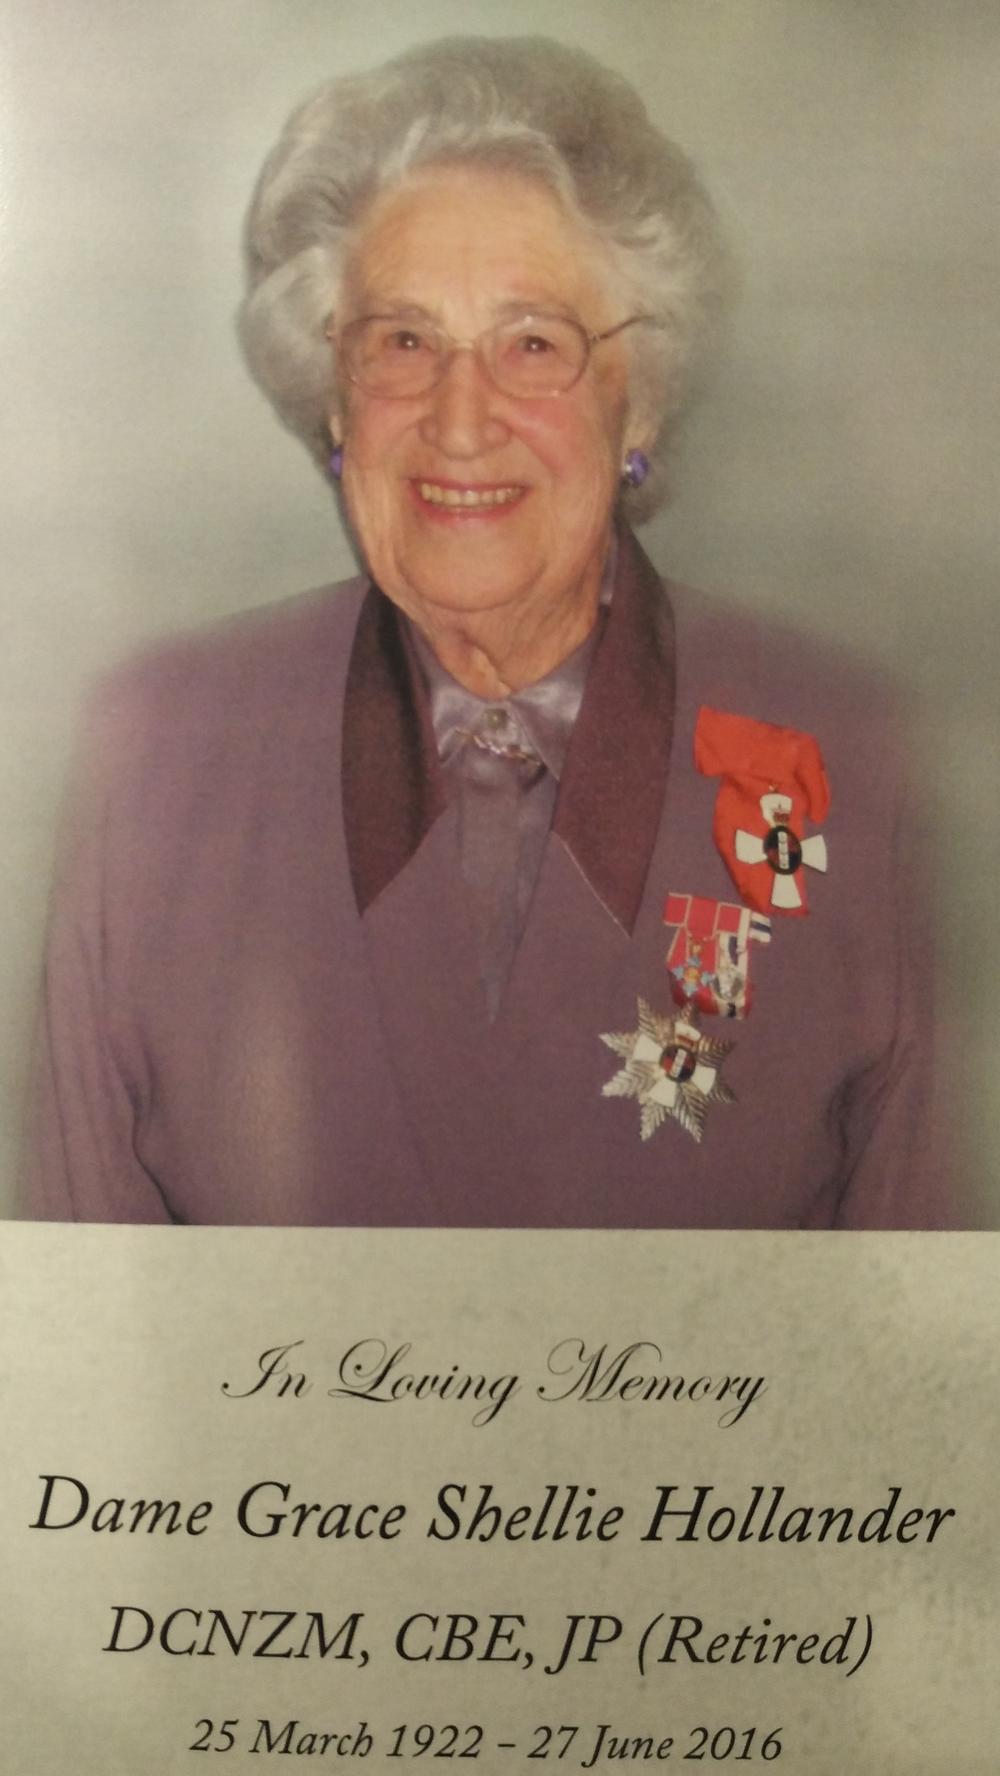 Courtesy: Dame Grace Hollander's family